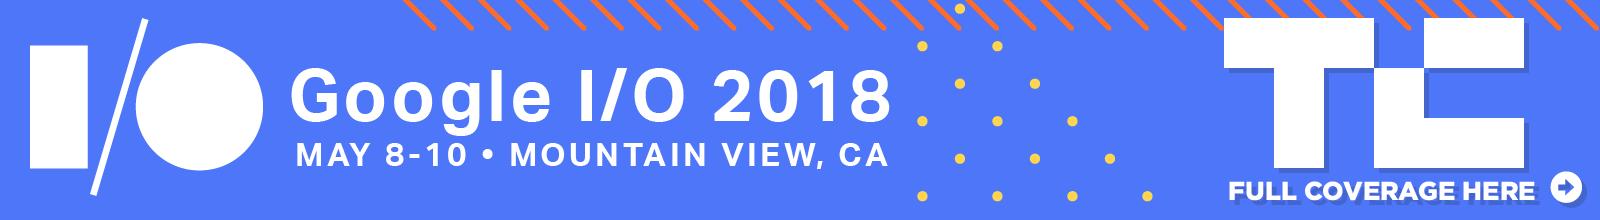 google io 2018 banne 11